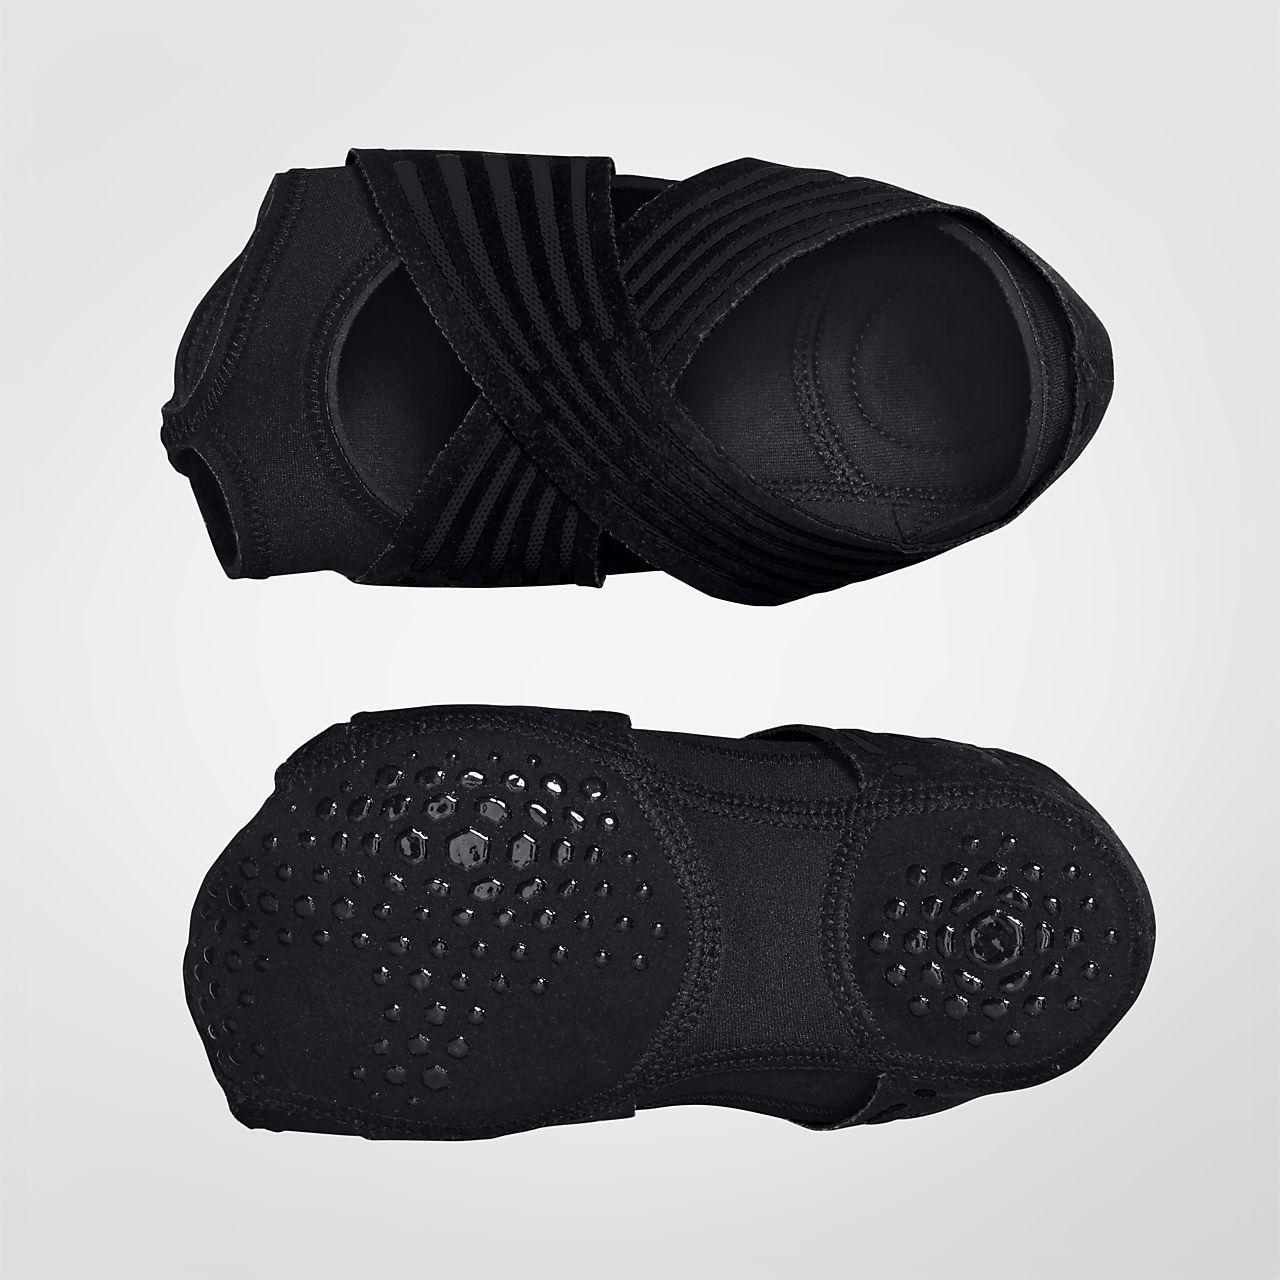 4 Trainingsschuh Studio Nike Wrap Damen wy8vN0OmnP